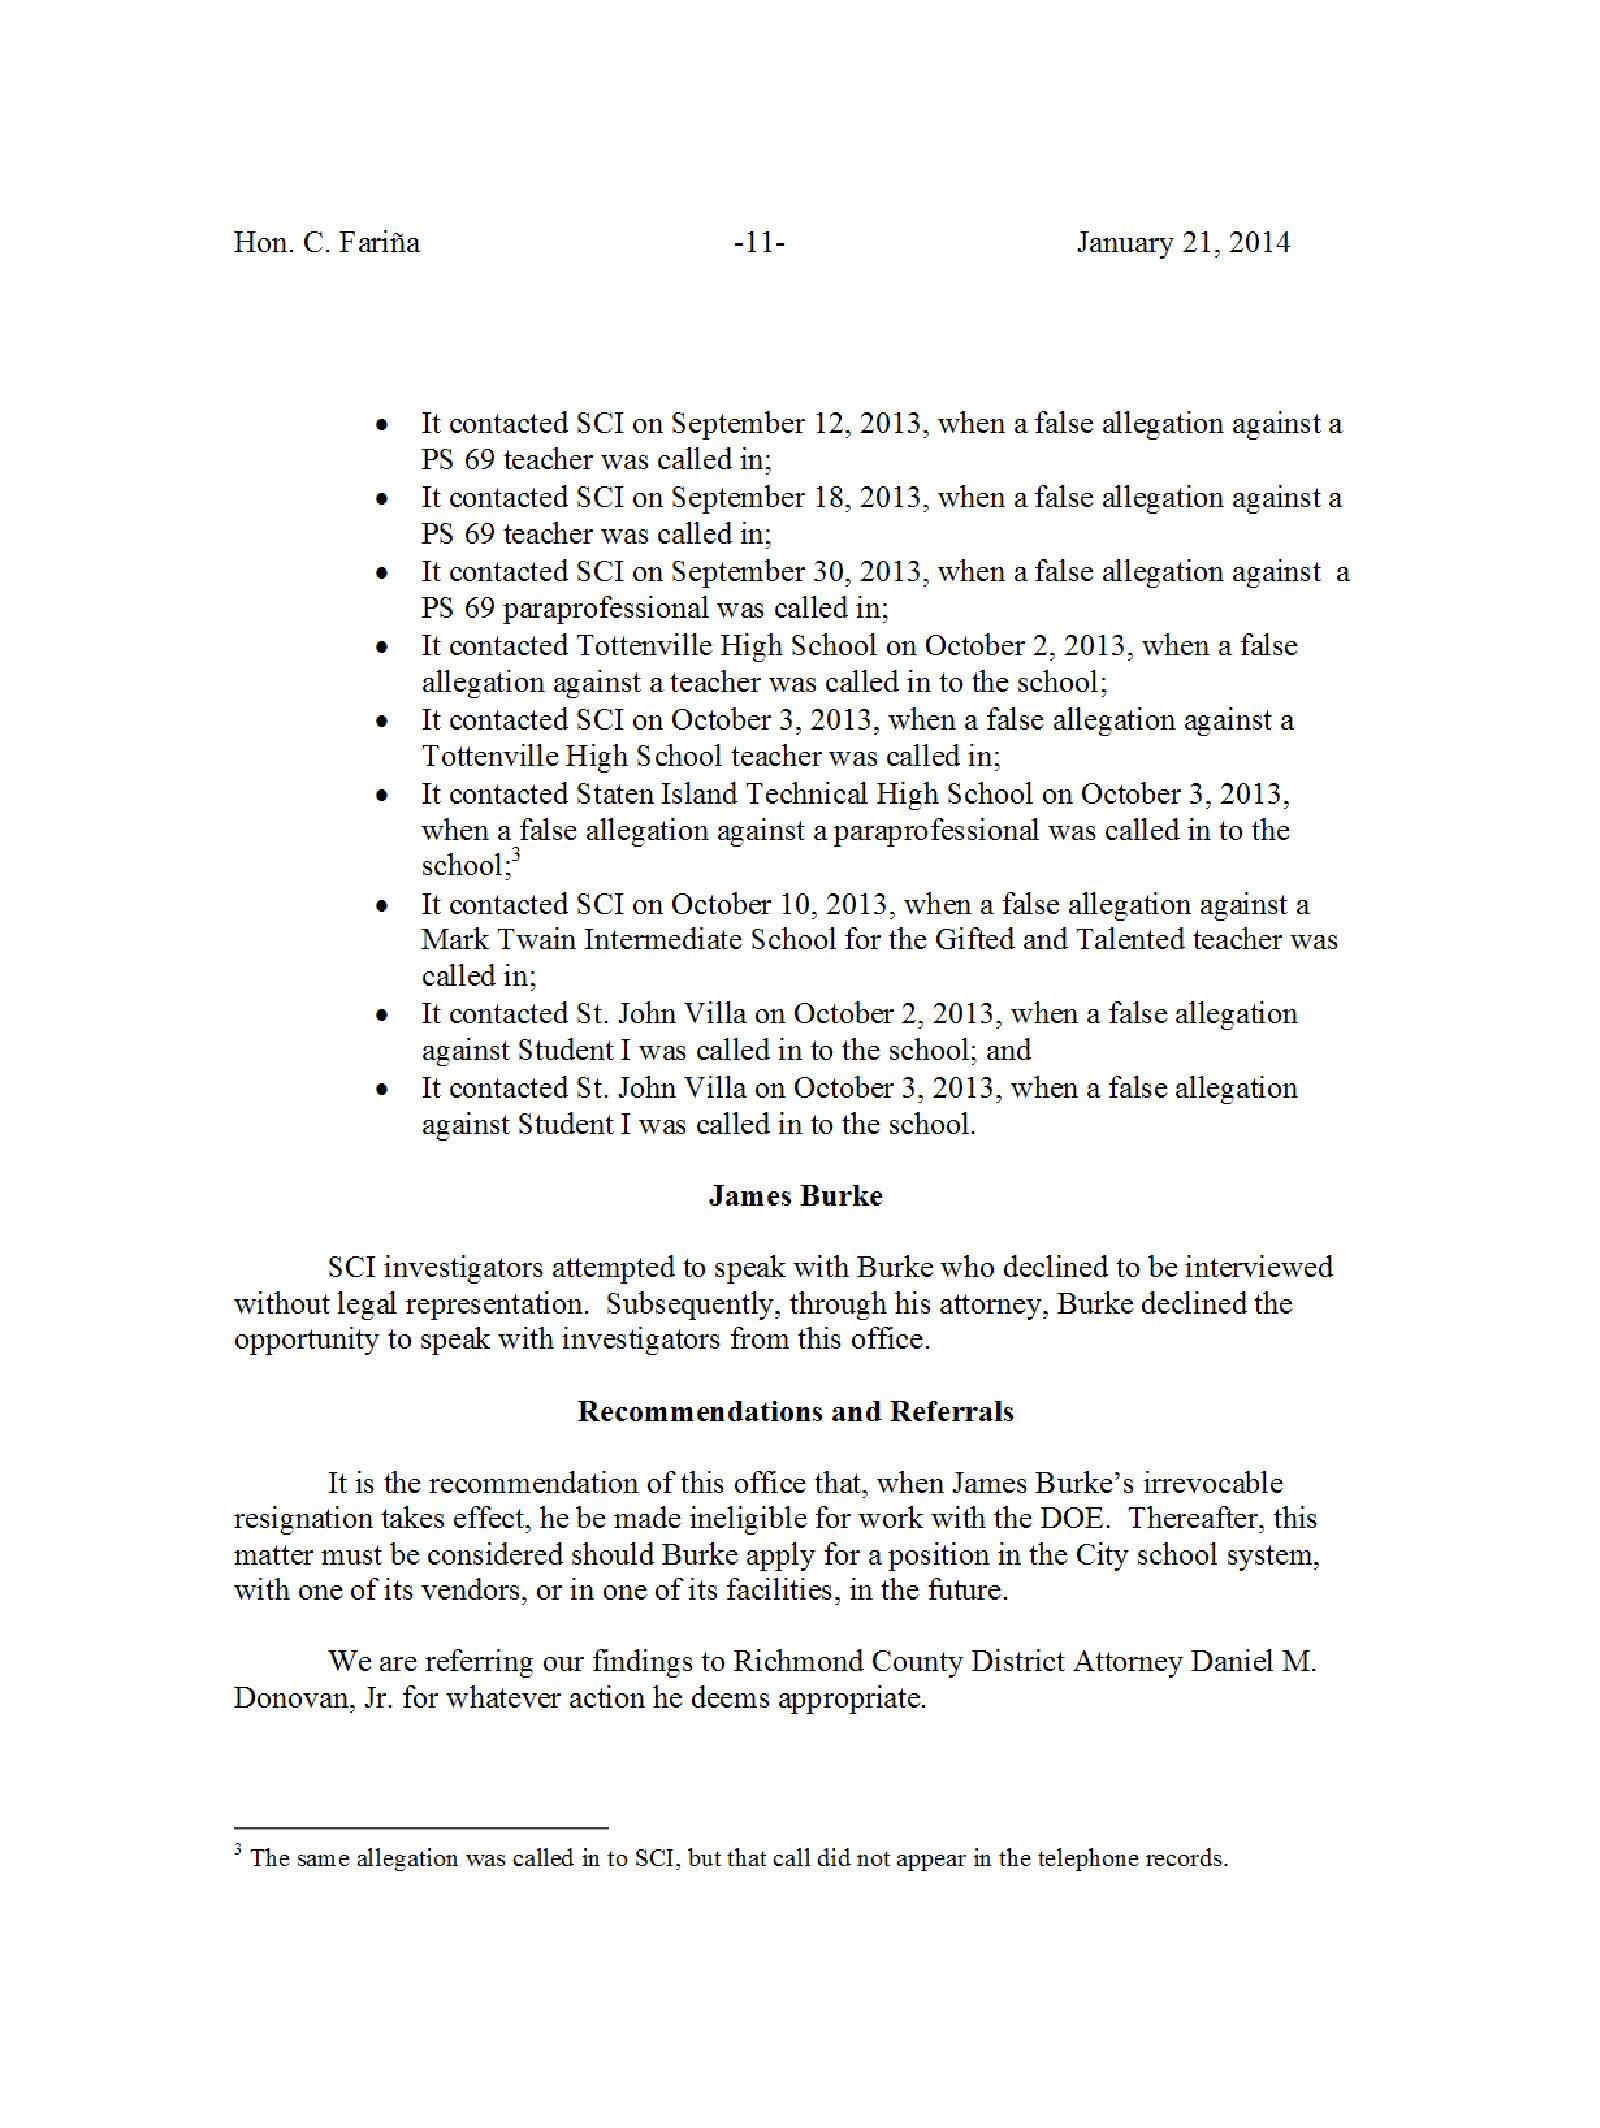 Copy of 1-22-2014 9-25-02 AM11.png